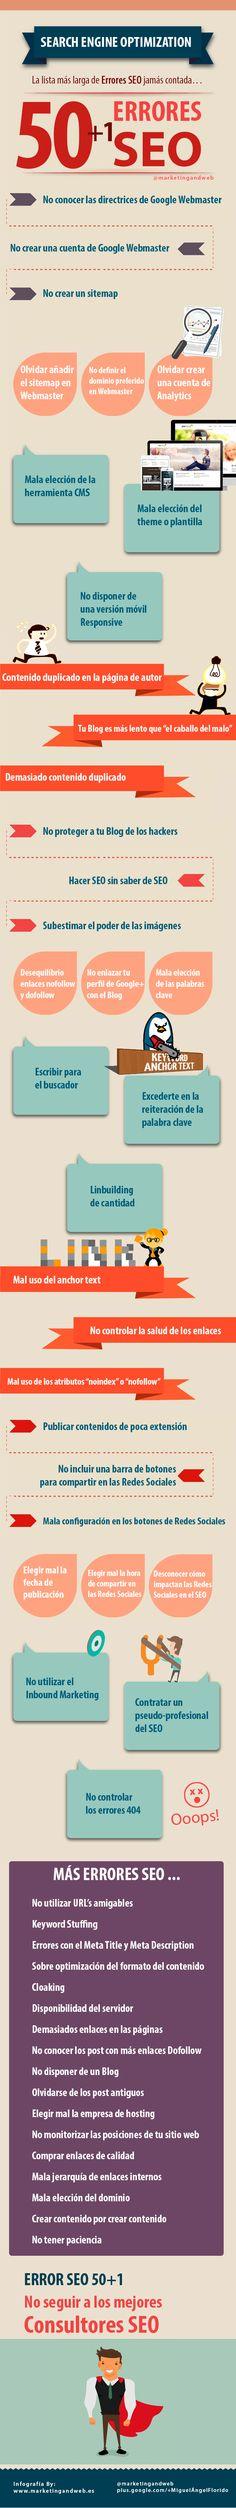 50 errores SEO + 1 #infografia